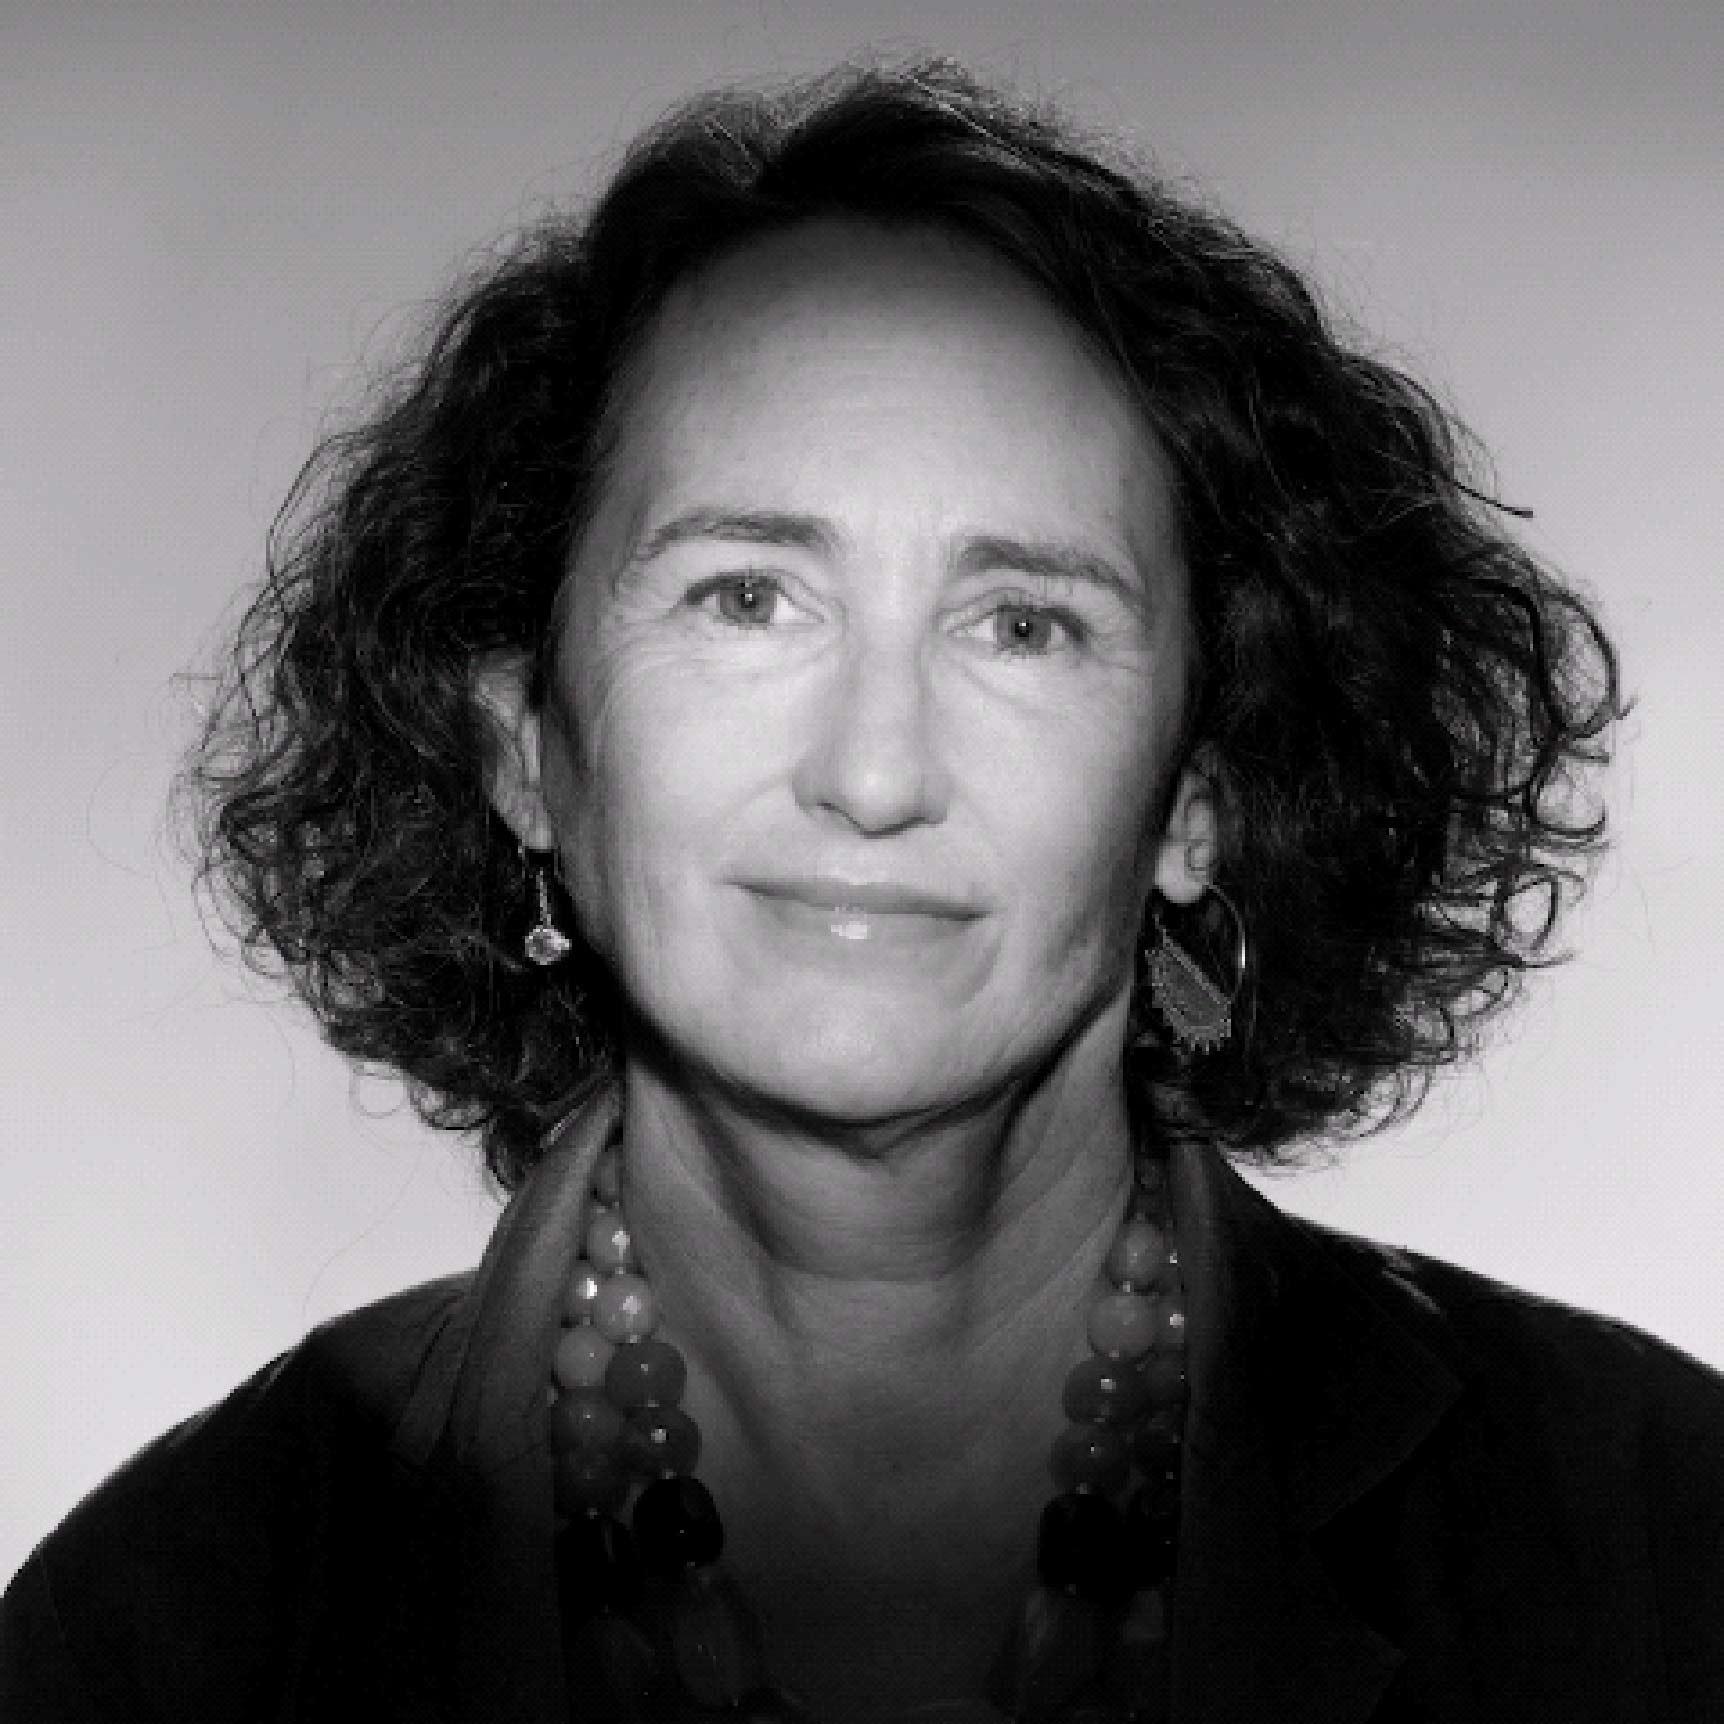 Julia Barfield